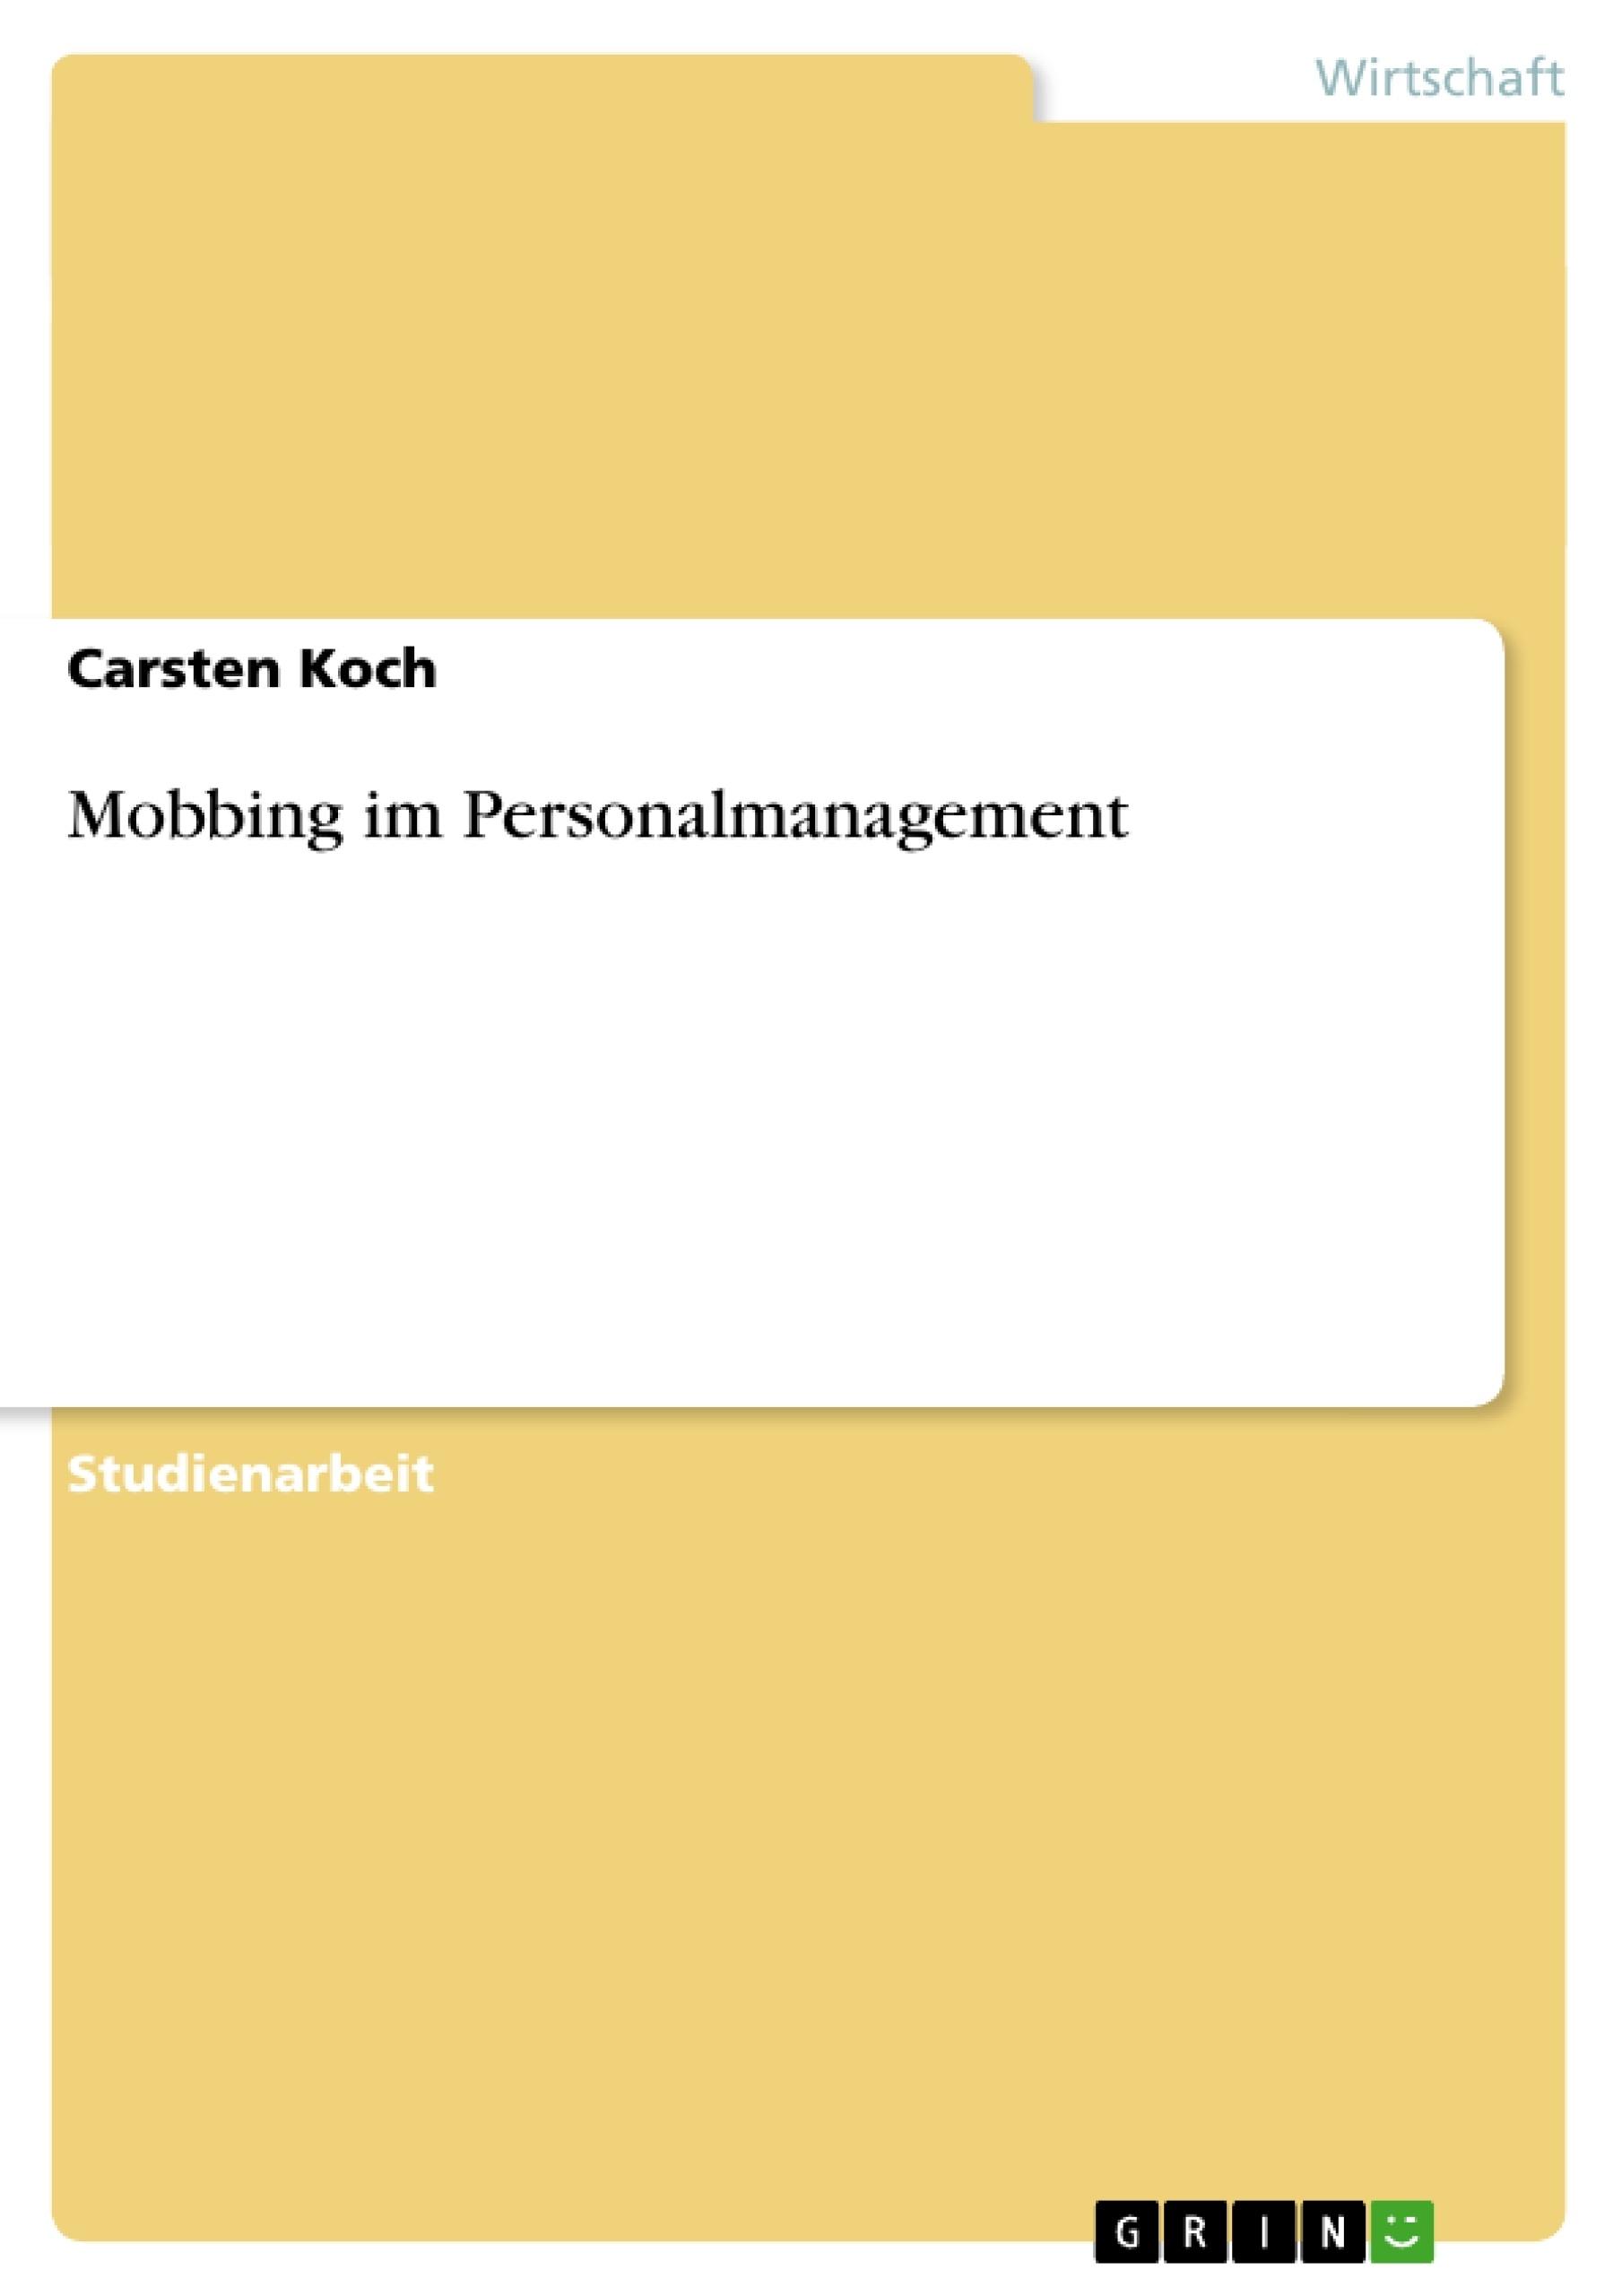 Titel: Mobbing im Personalmanagement